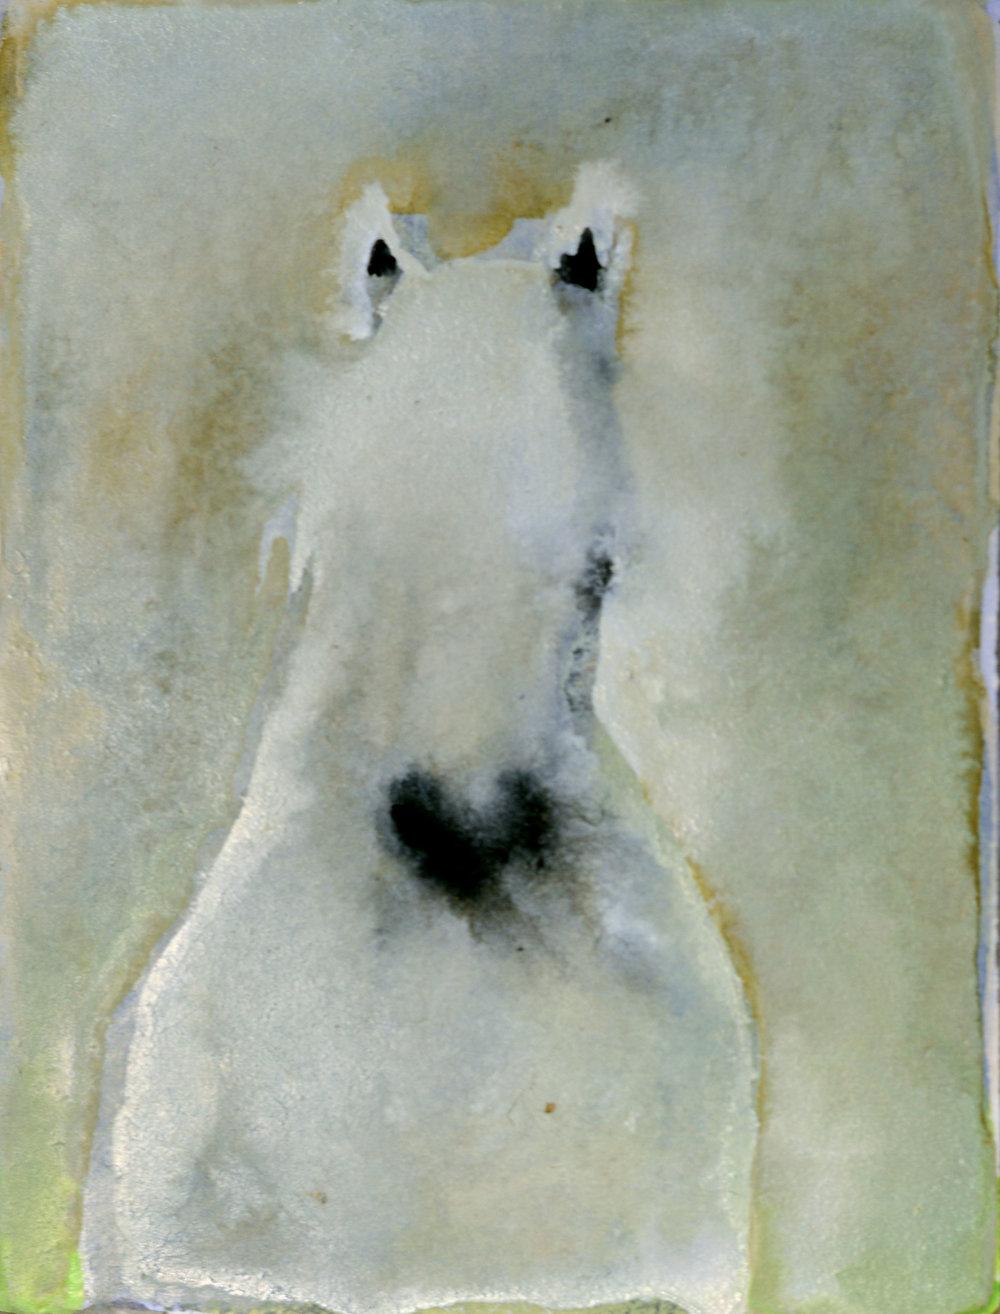 White Horse (on White)_4x3 inset on 11 x 7.5 paper.jpg